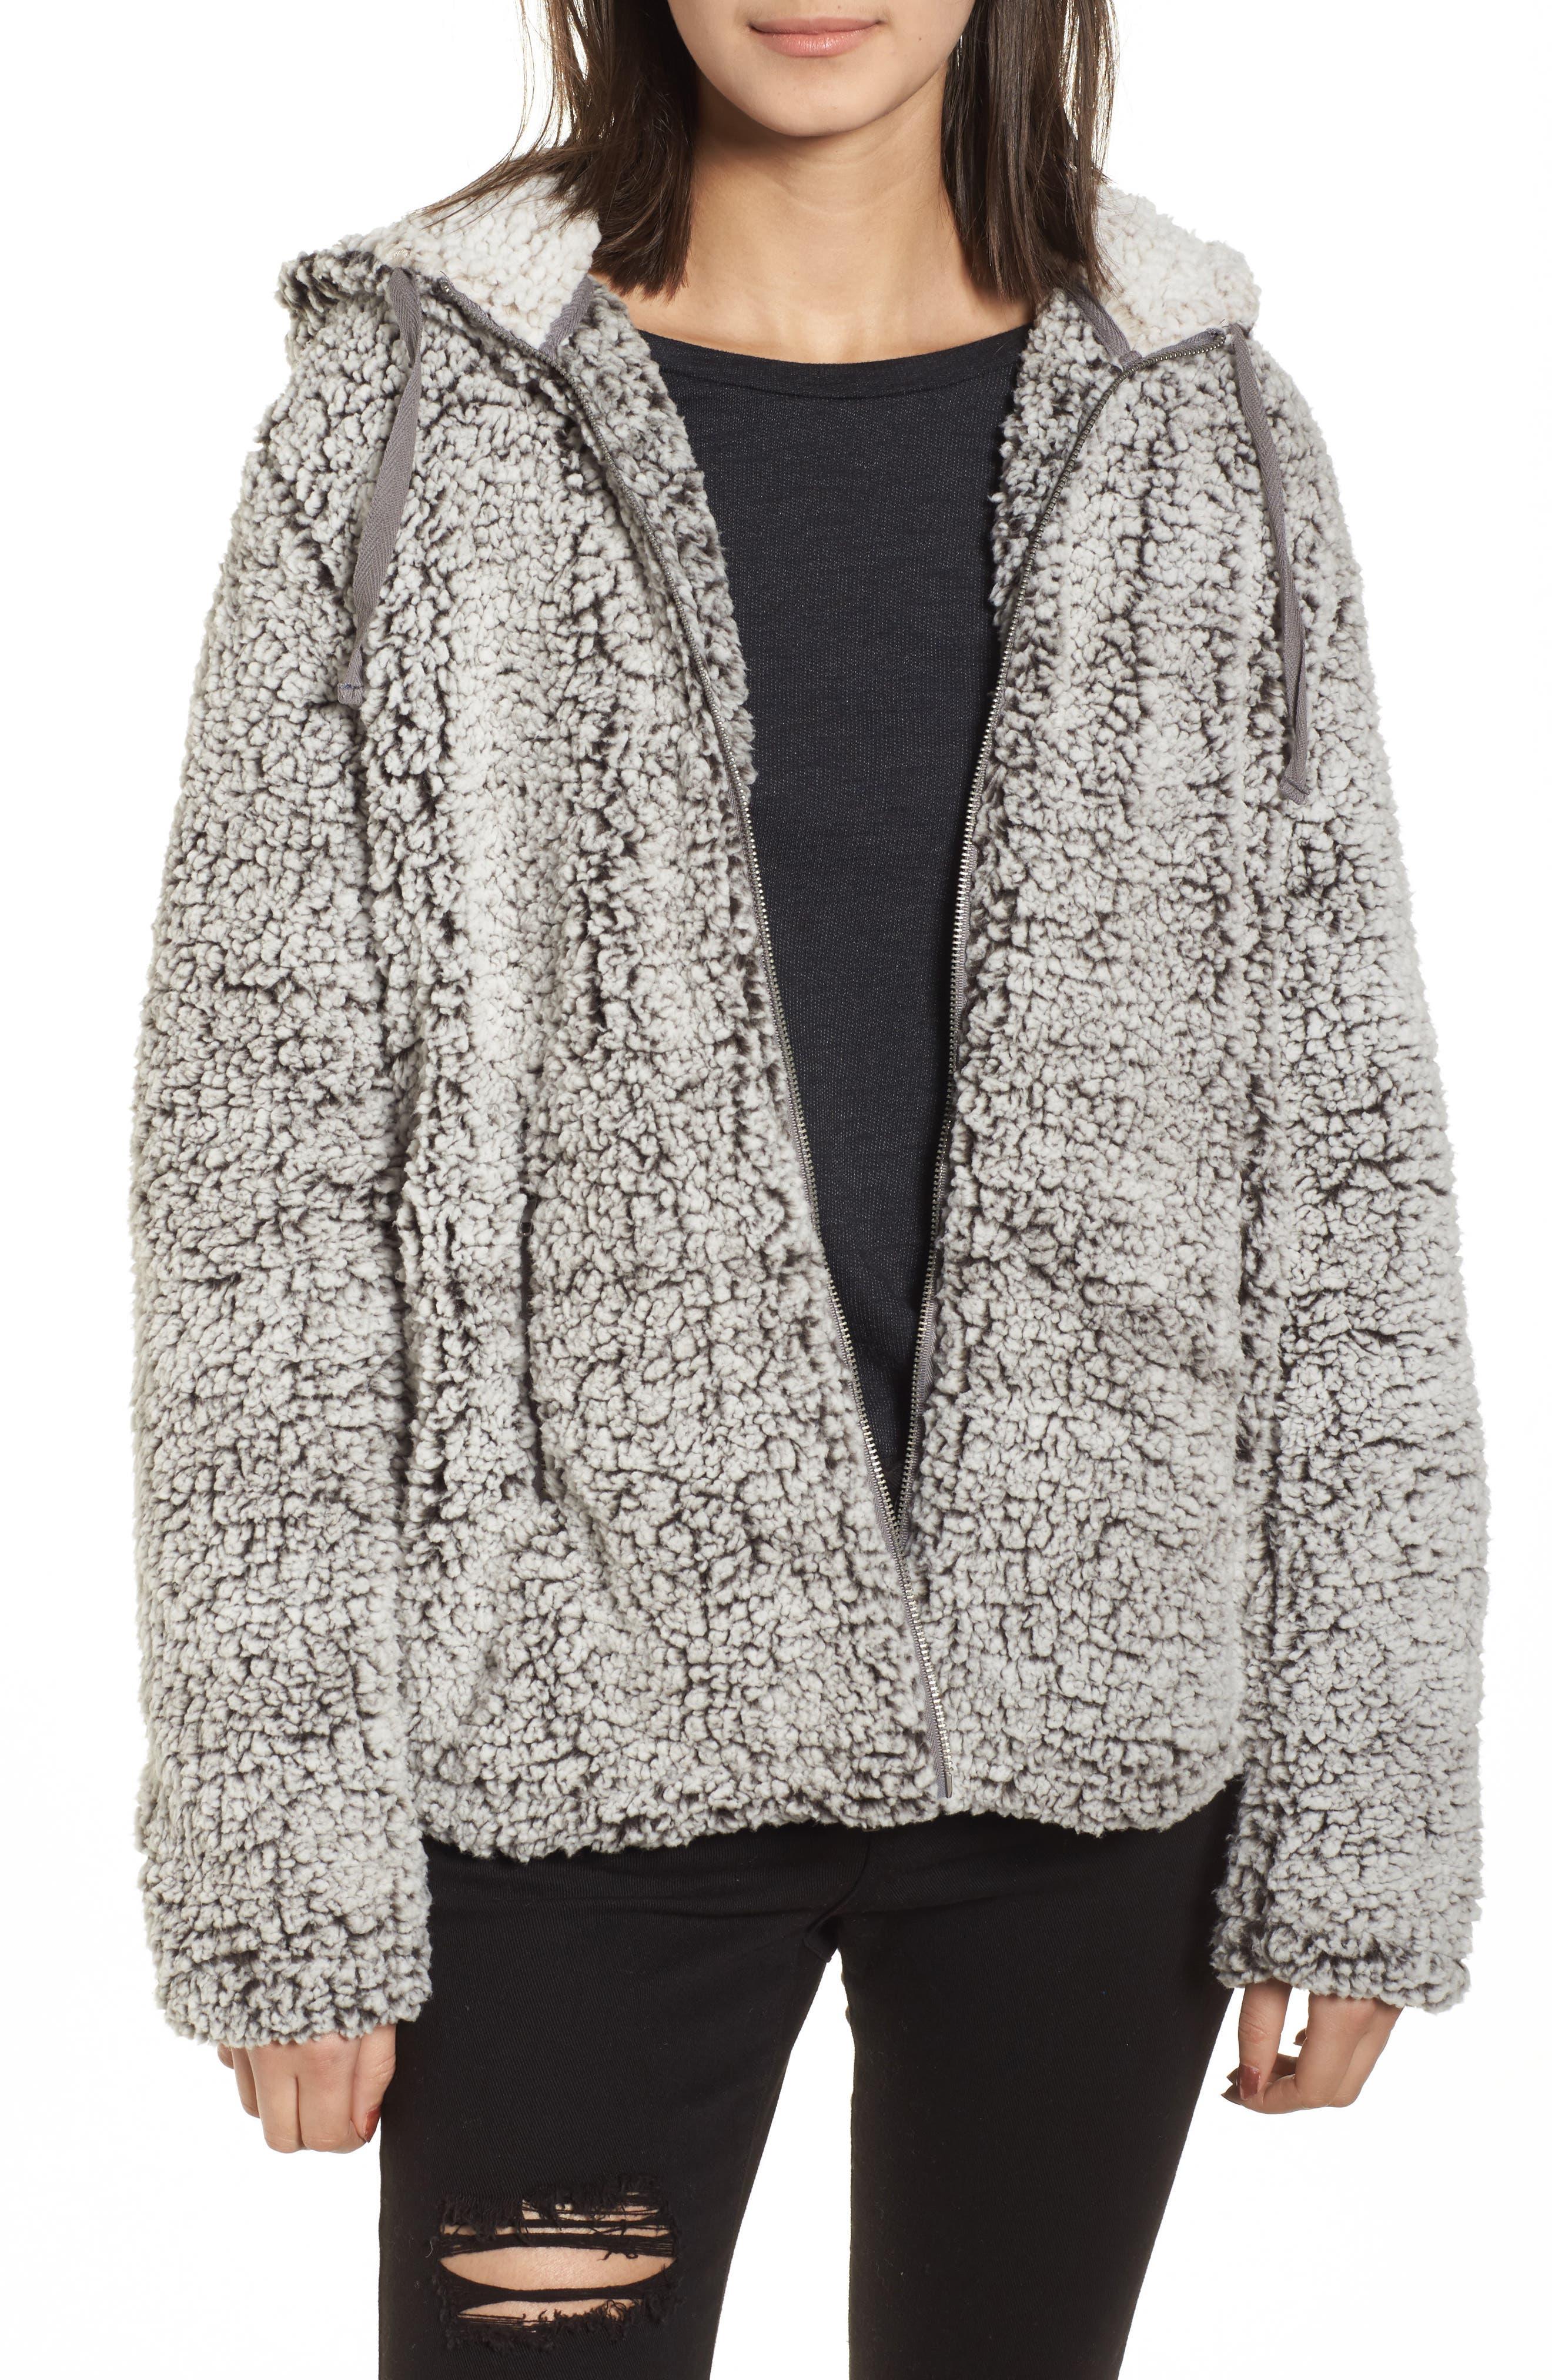 Main Image - Thread & Supply Brandon Fleece Jacket